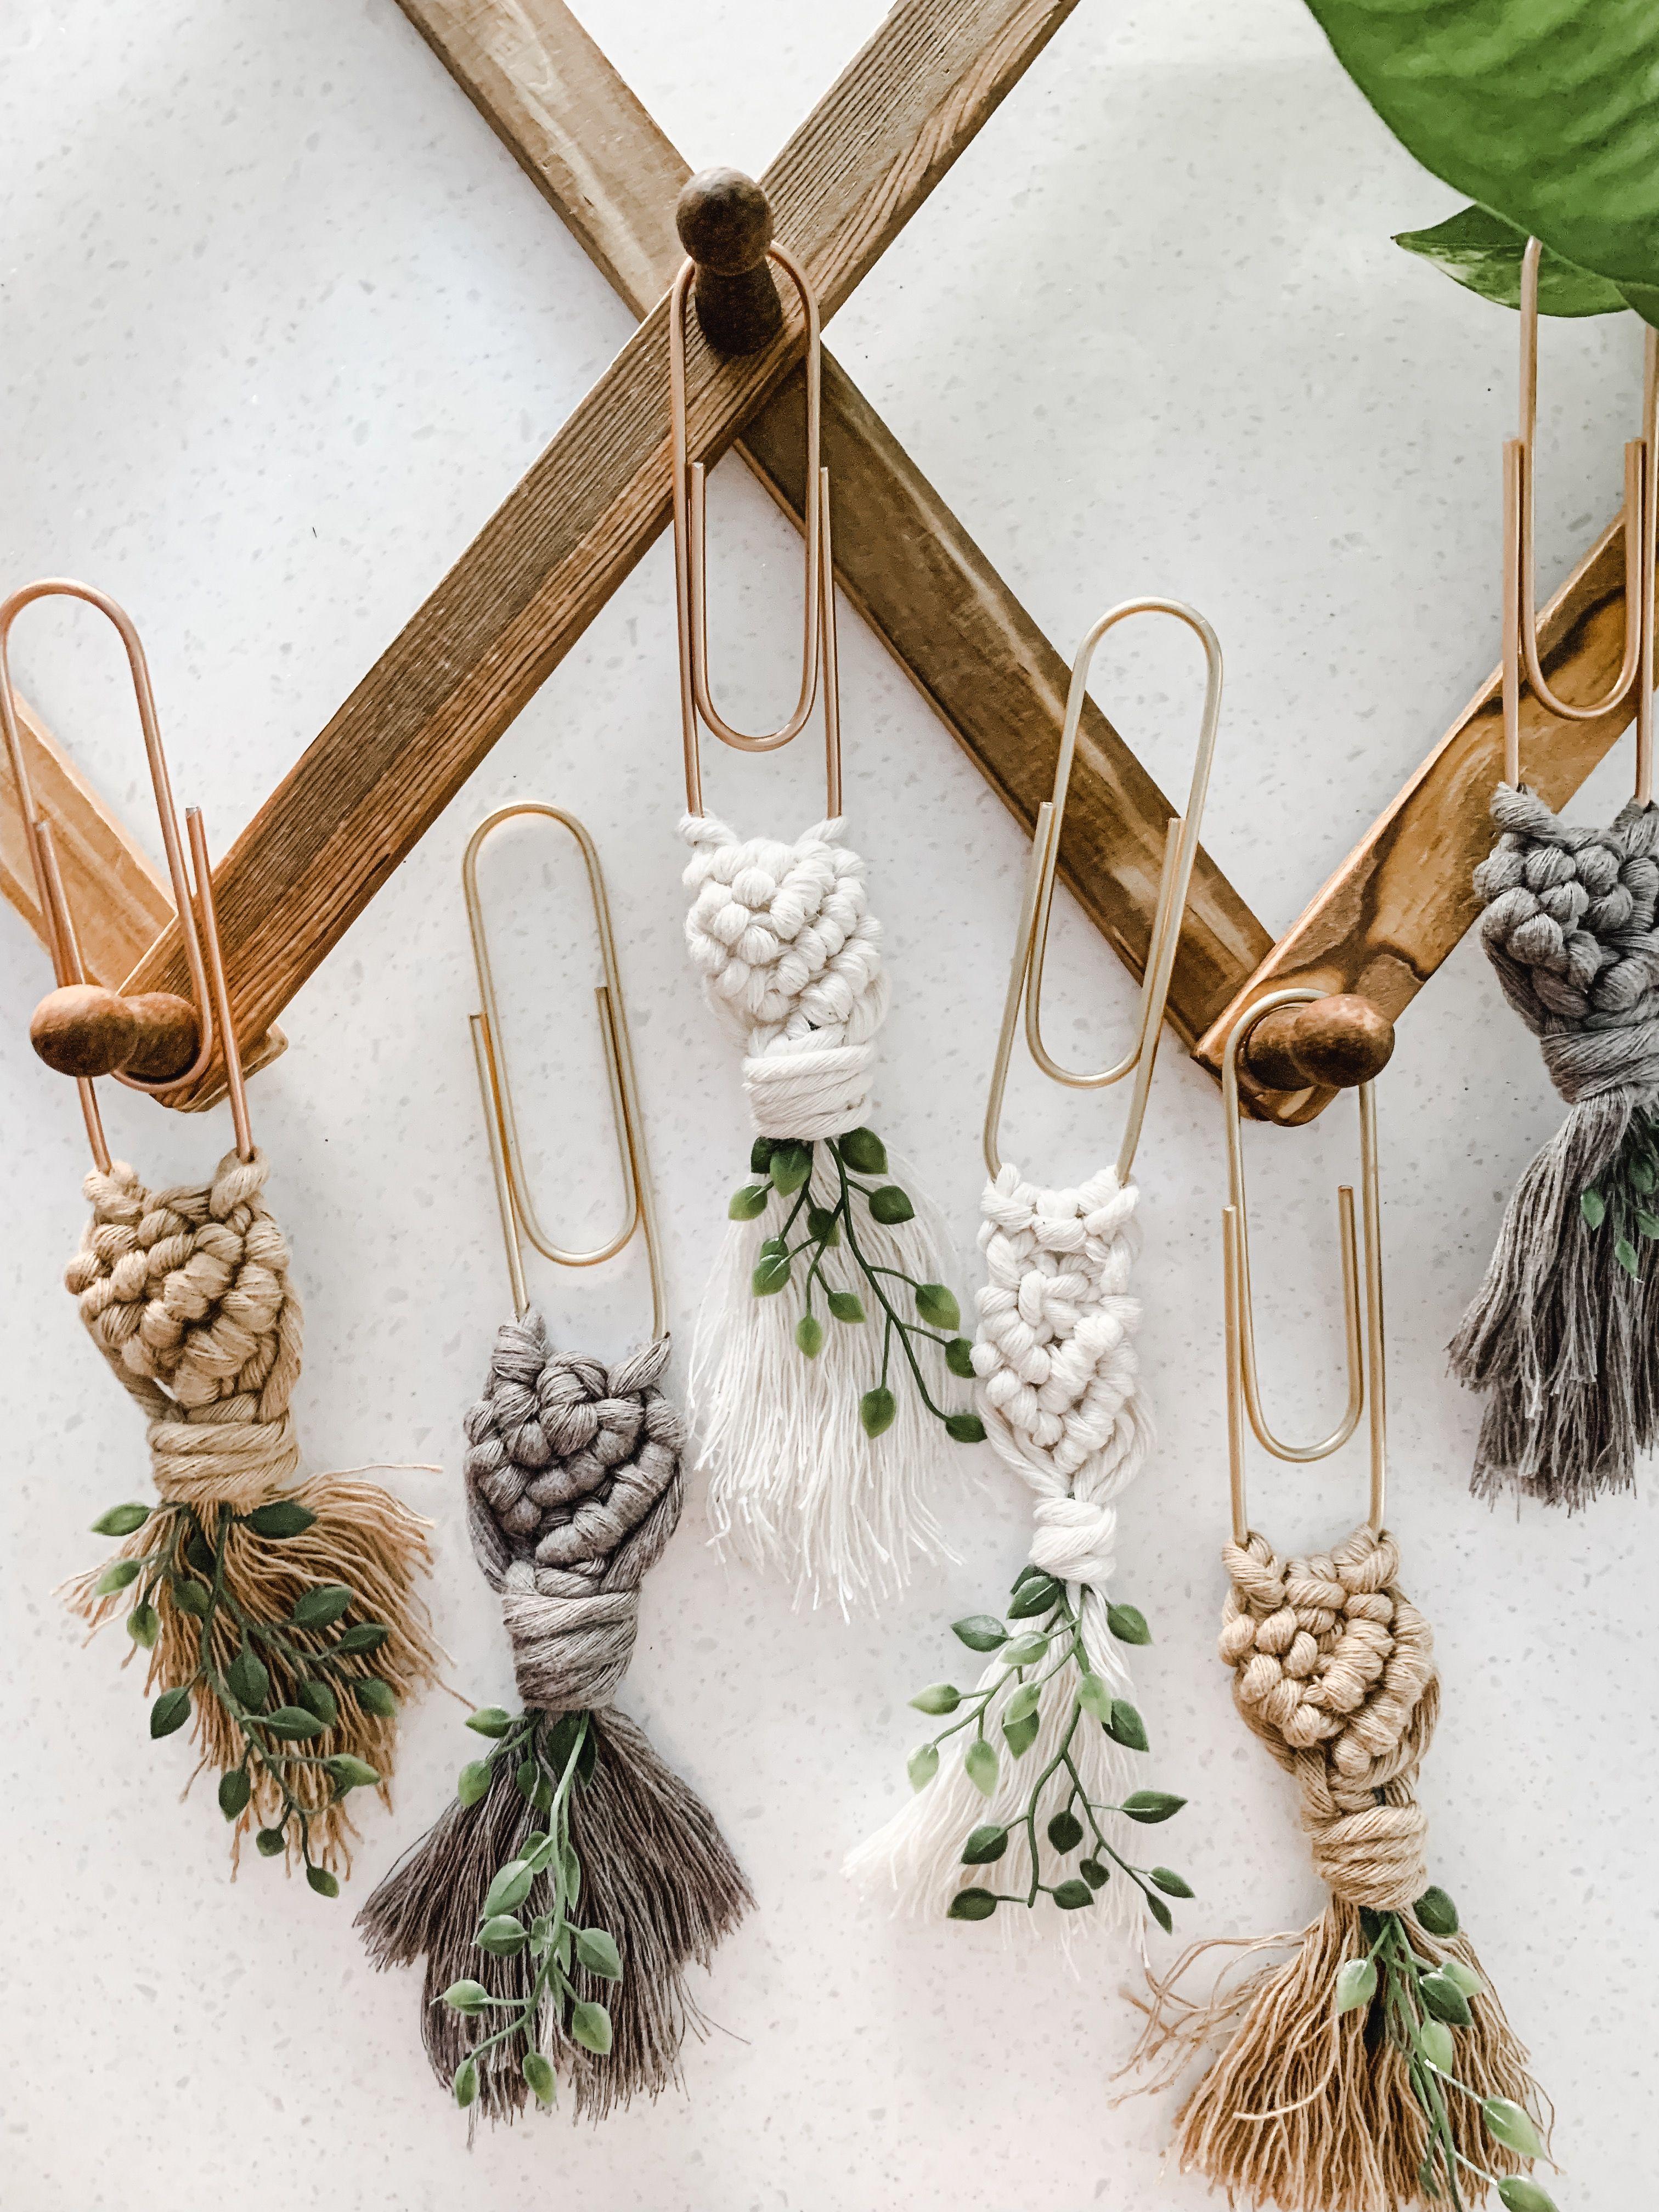 Macrame Bookmarks Bookmarks Handmade Chritmas Decorations Crafts